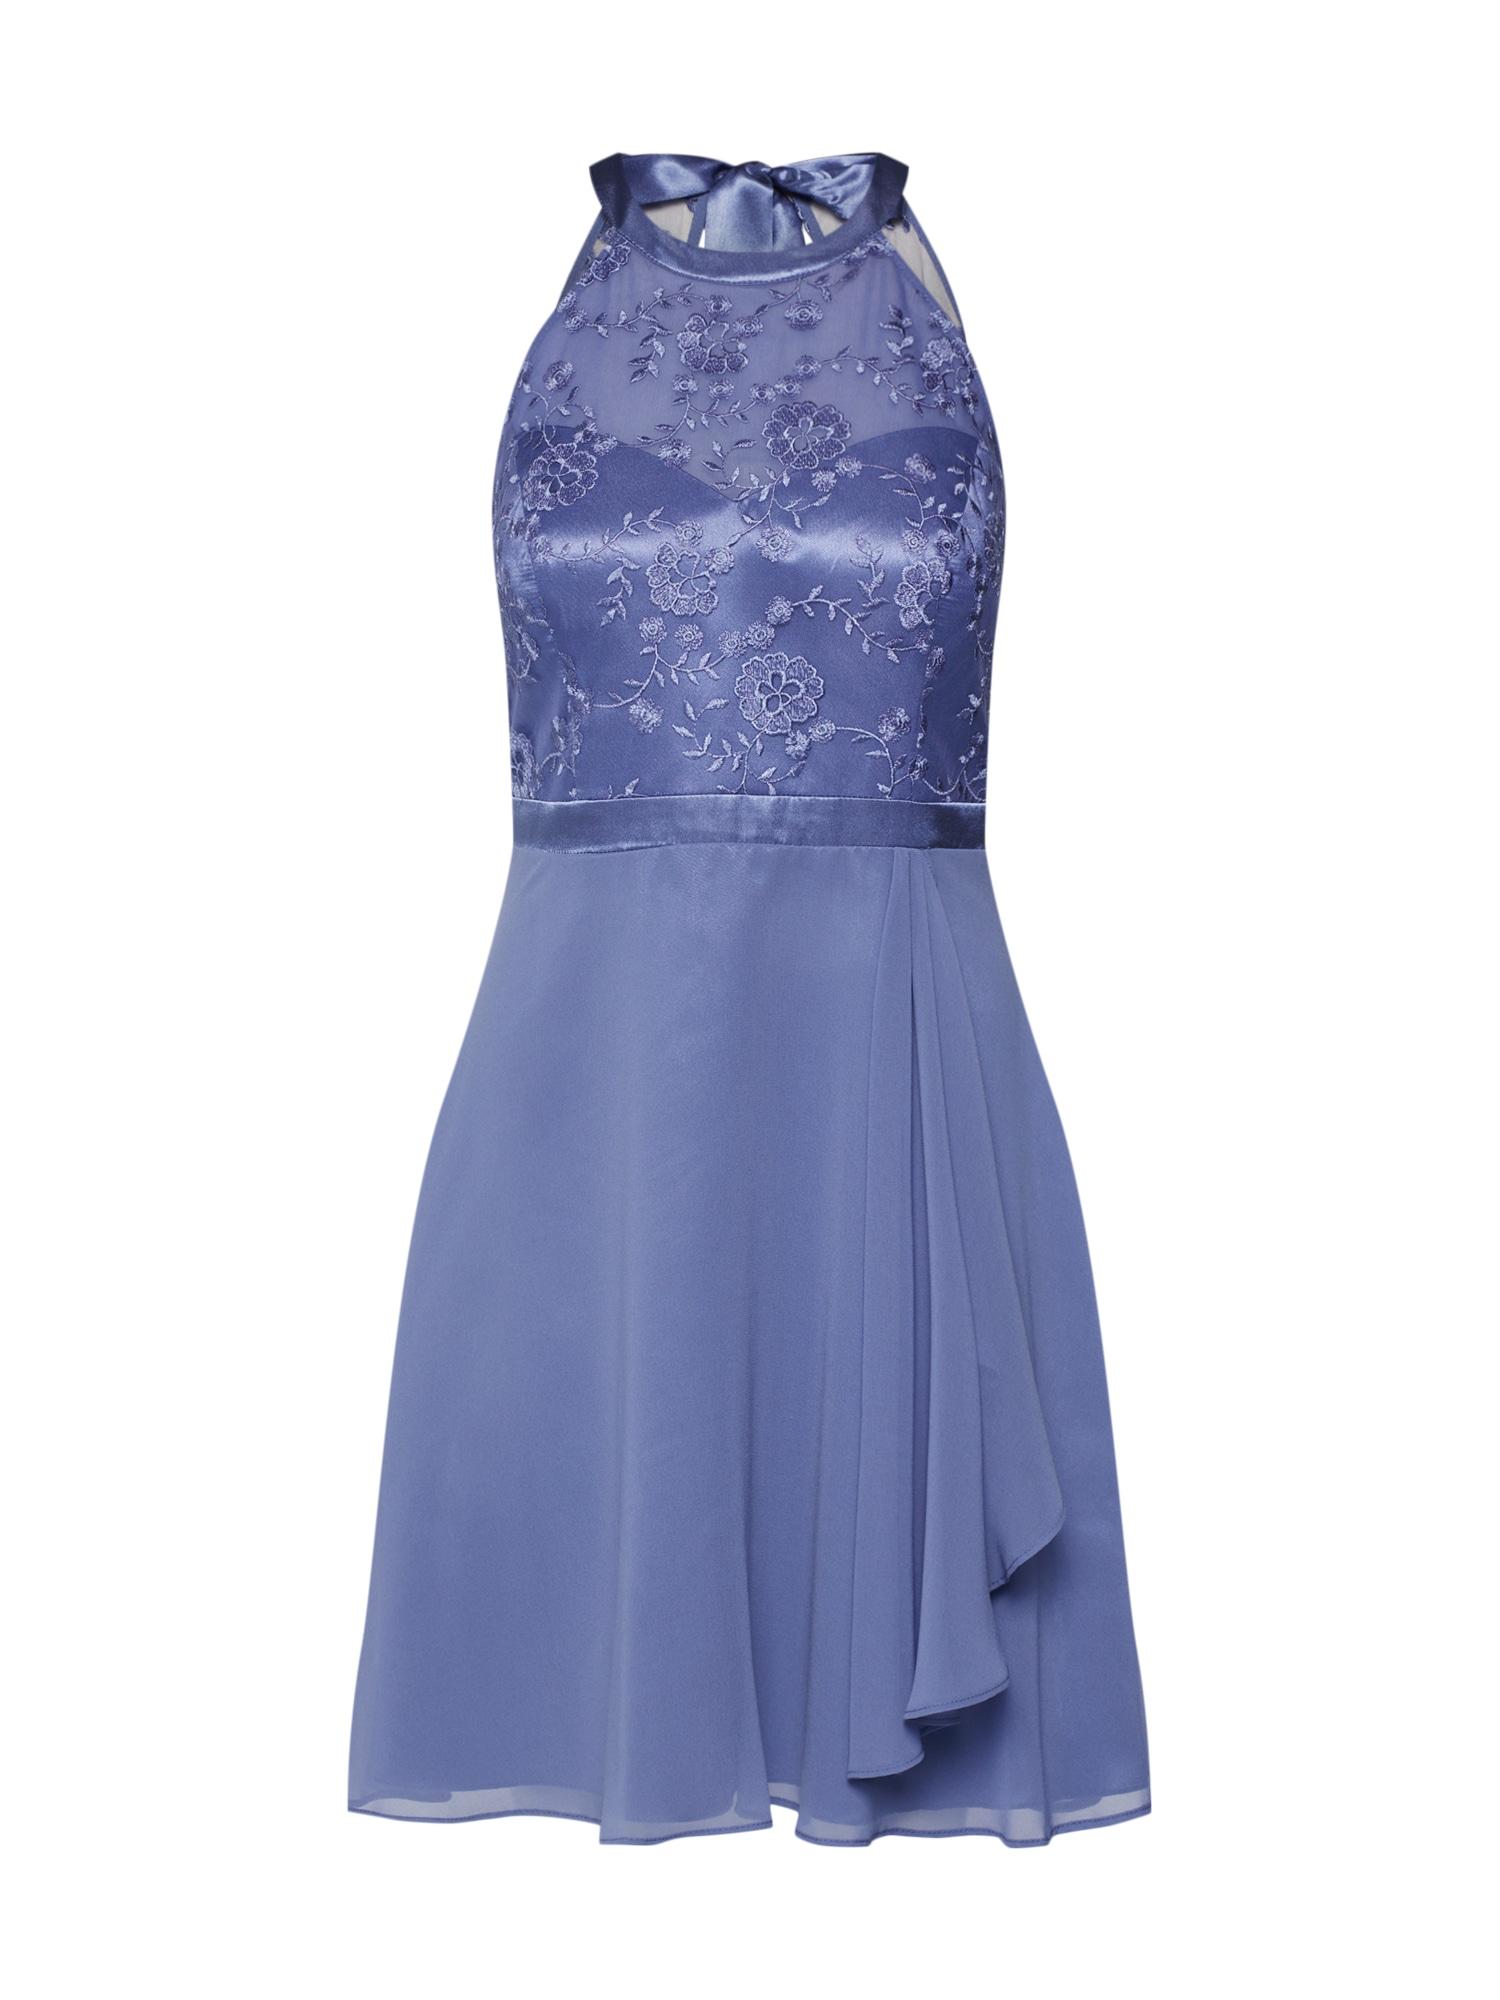 "Vera Mont Kokteilinė suknelė tamsiai mėlyna / sodri mėlyna (""karališka"")"